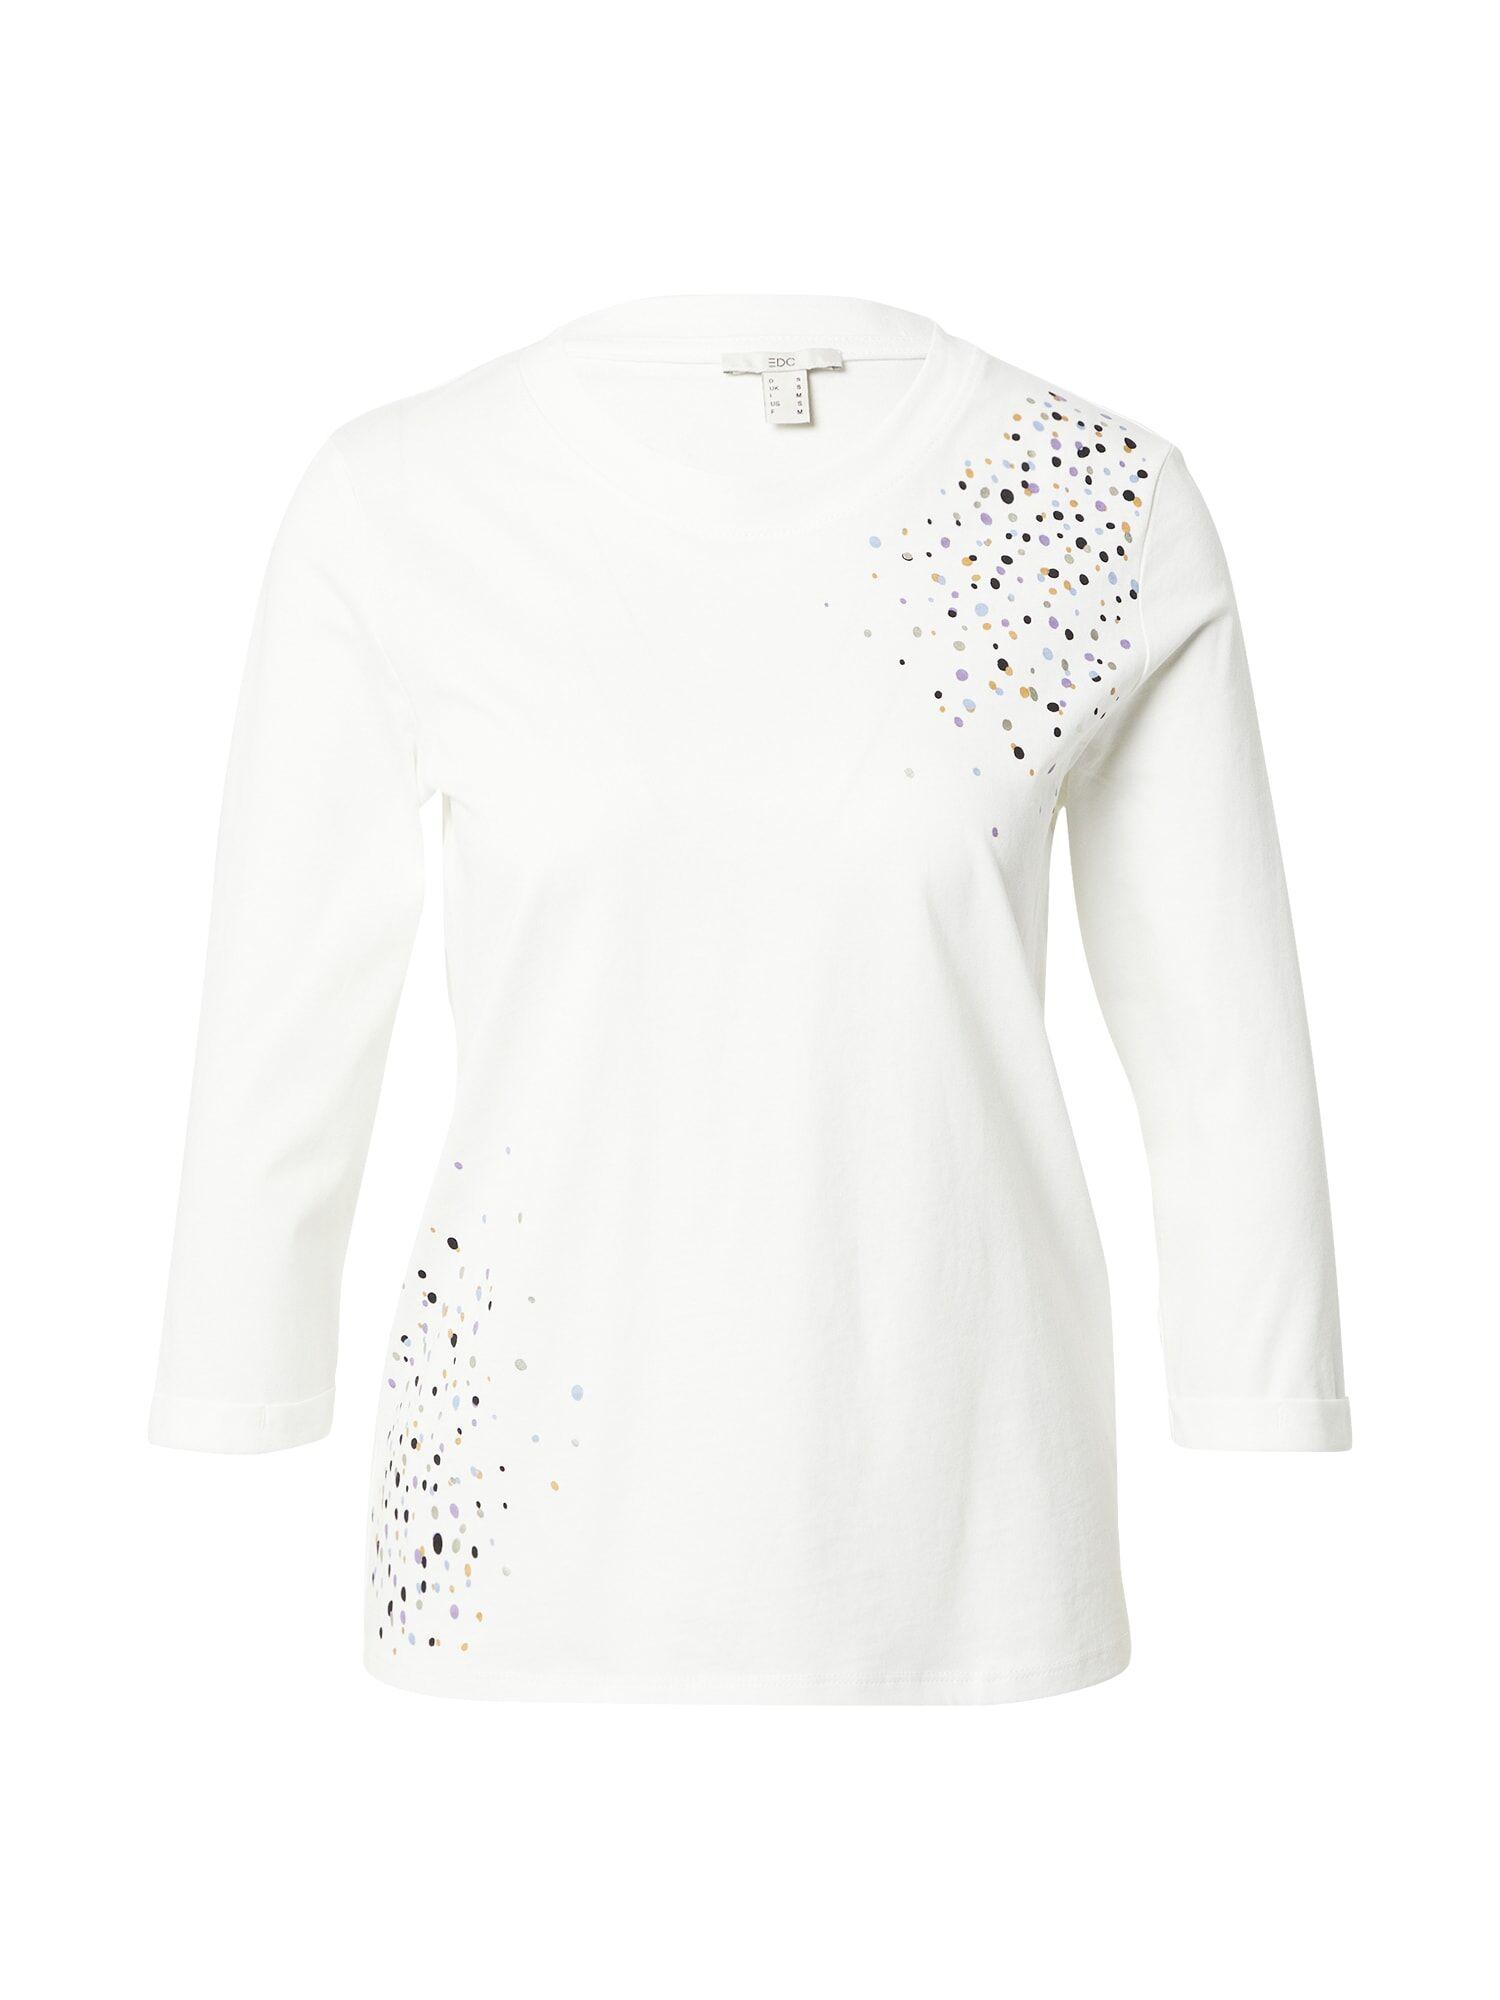 Esprit T-shirt  - Blanc - Taille: M - female